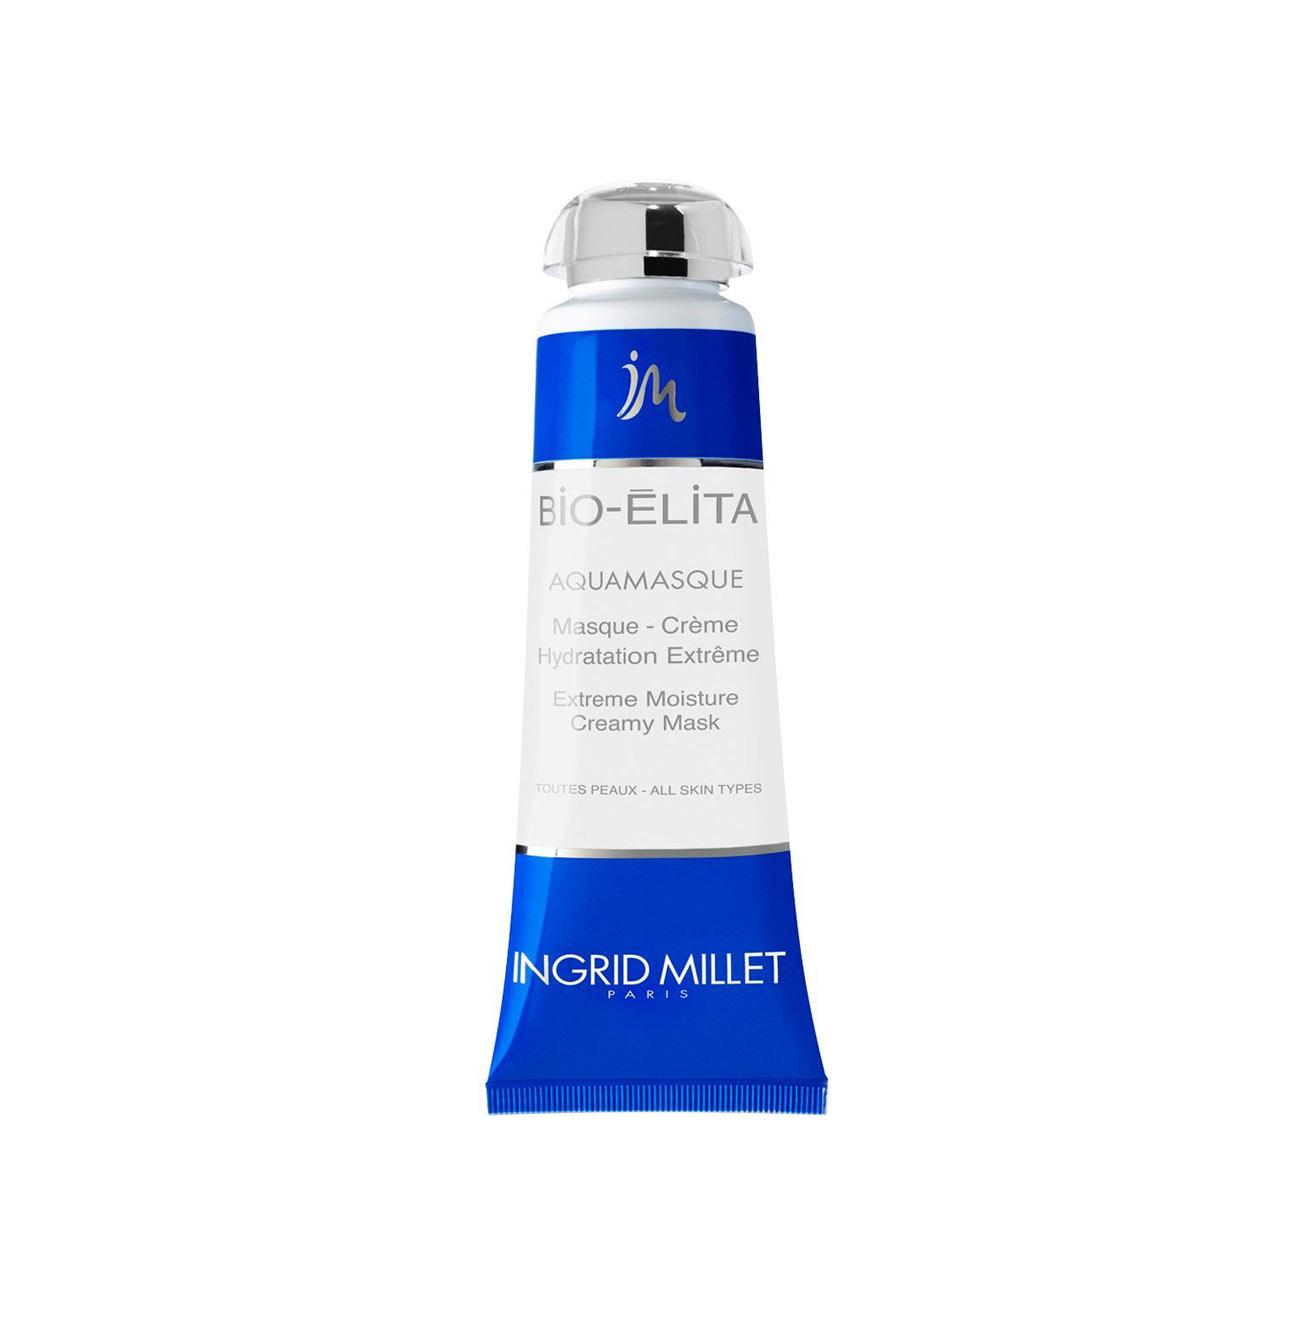 2-Aquamasque-Maschera-per-il-viso-Ingrid-Millet-Cosmetici-Bio-Elita-Linea-Idratazione-Intensa-Dispar-SpA.jpg